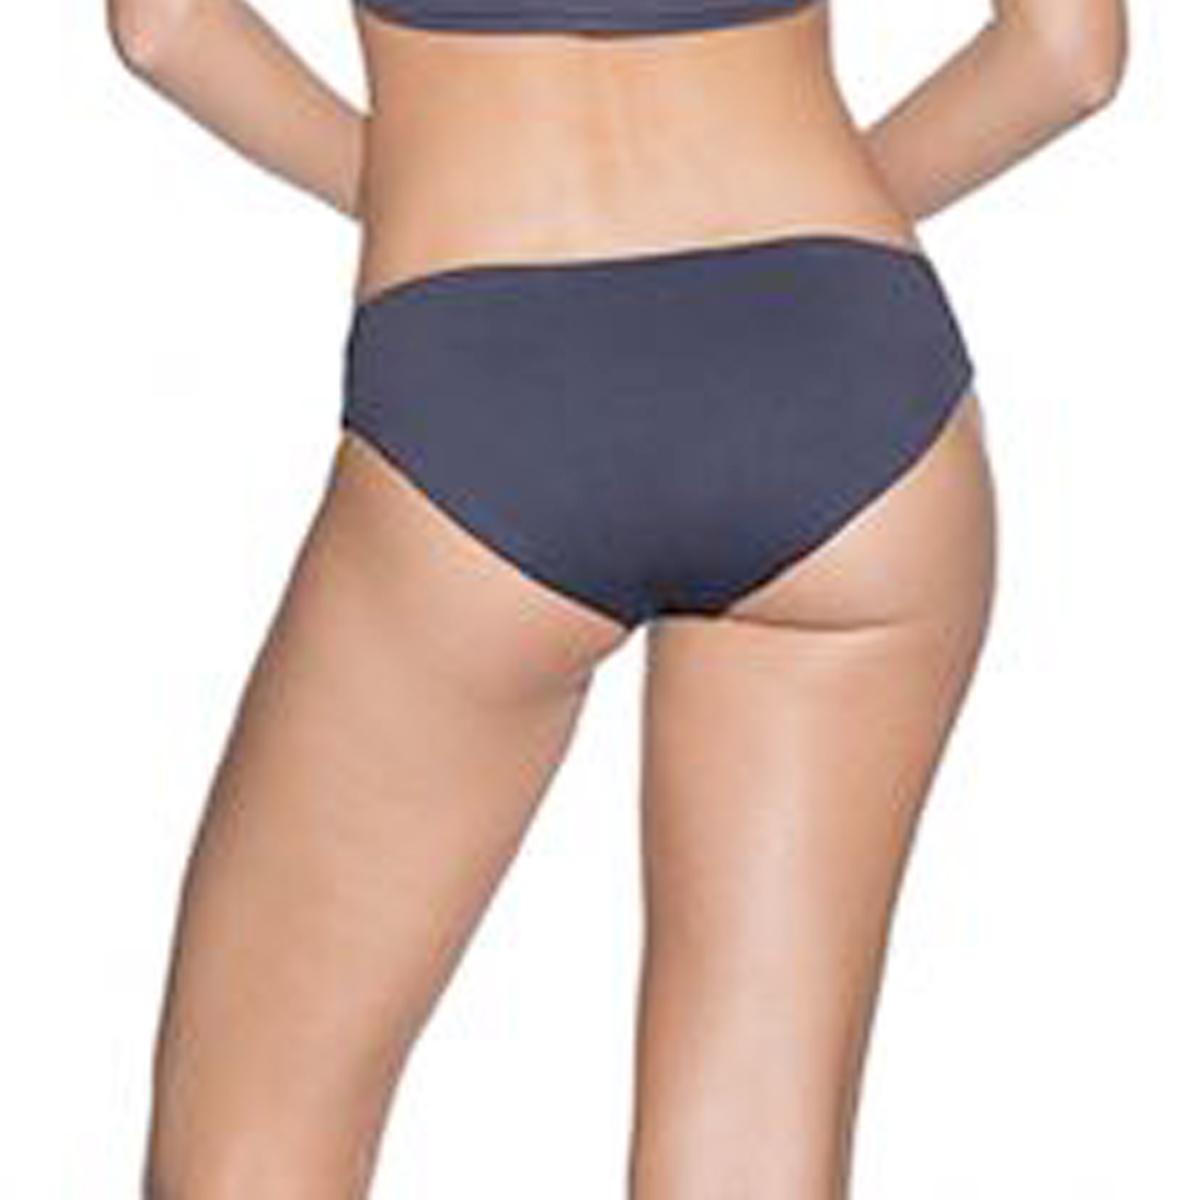 9aec9118c0 Bikini 2 pièces réversible bleu - Marque mode tendance maaji 2018